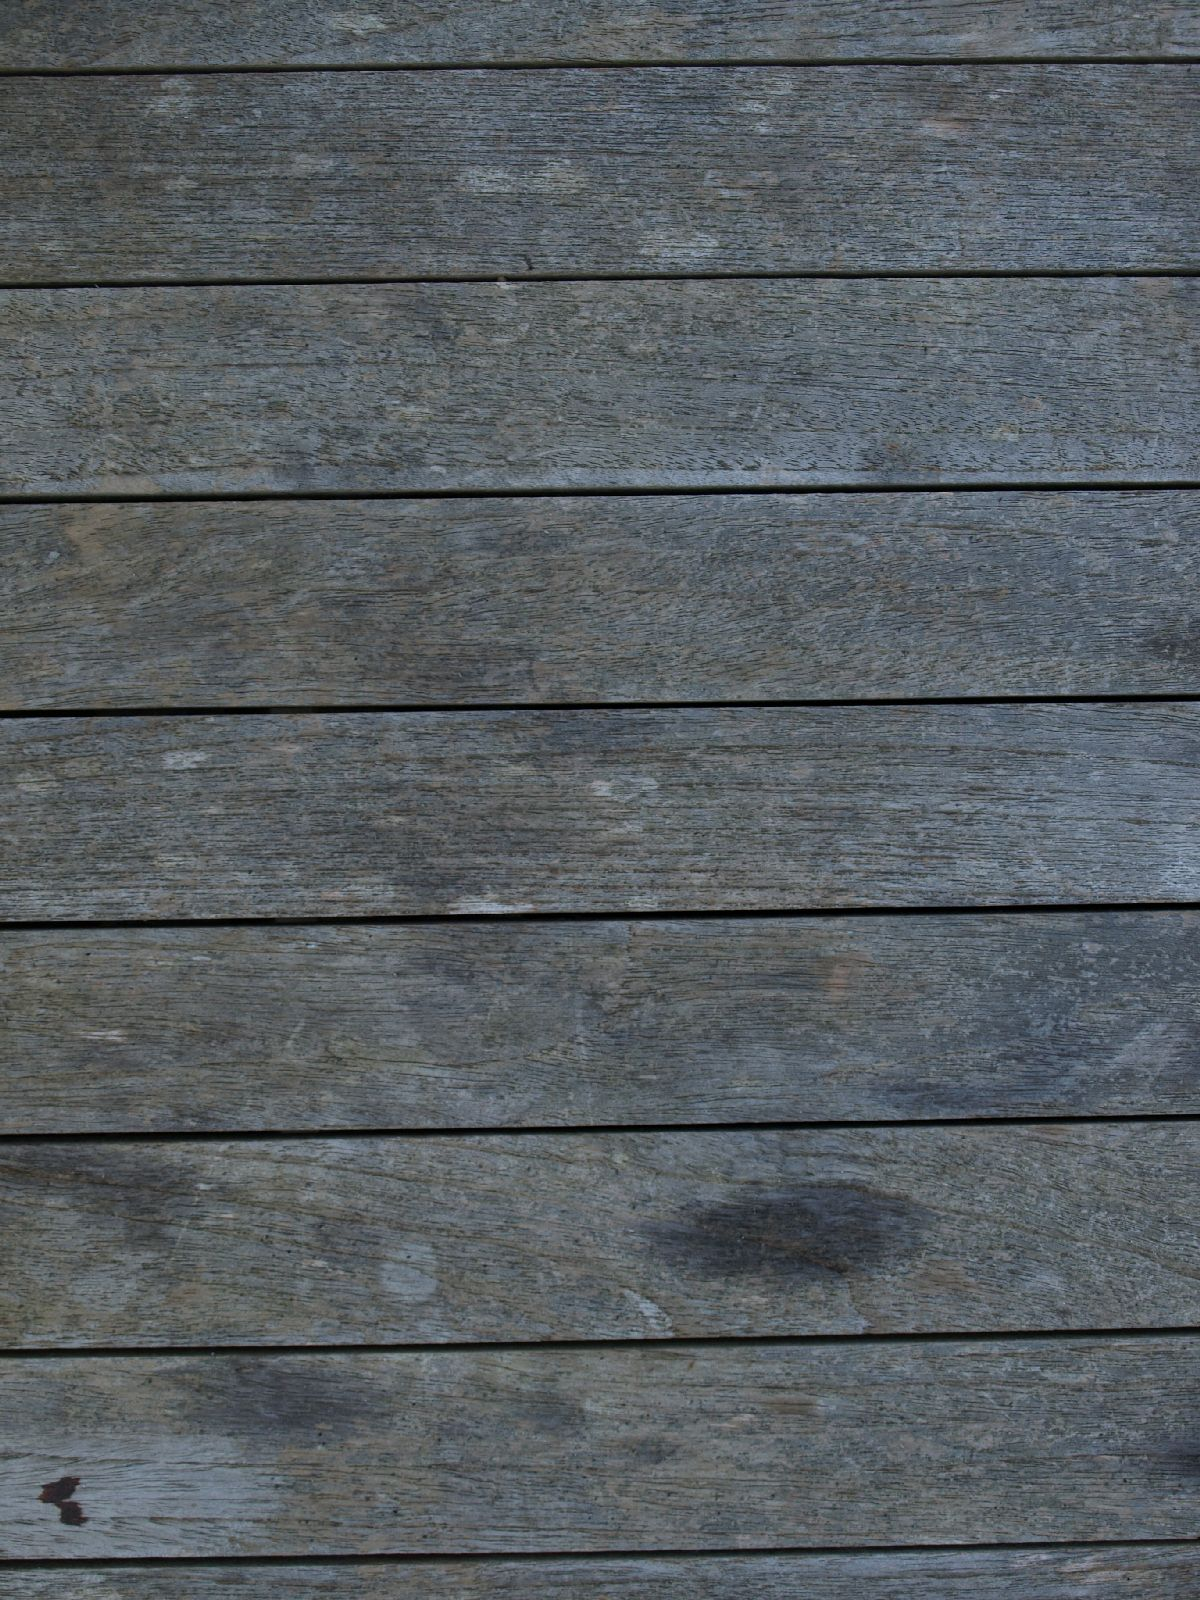 Wood_Texture_A_P9114831